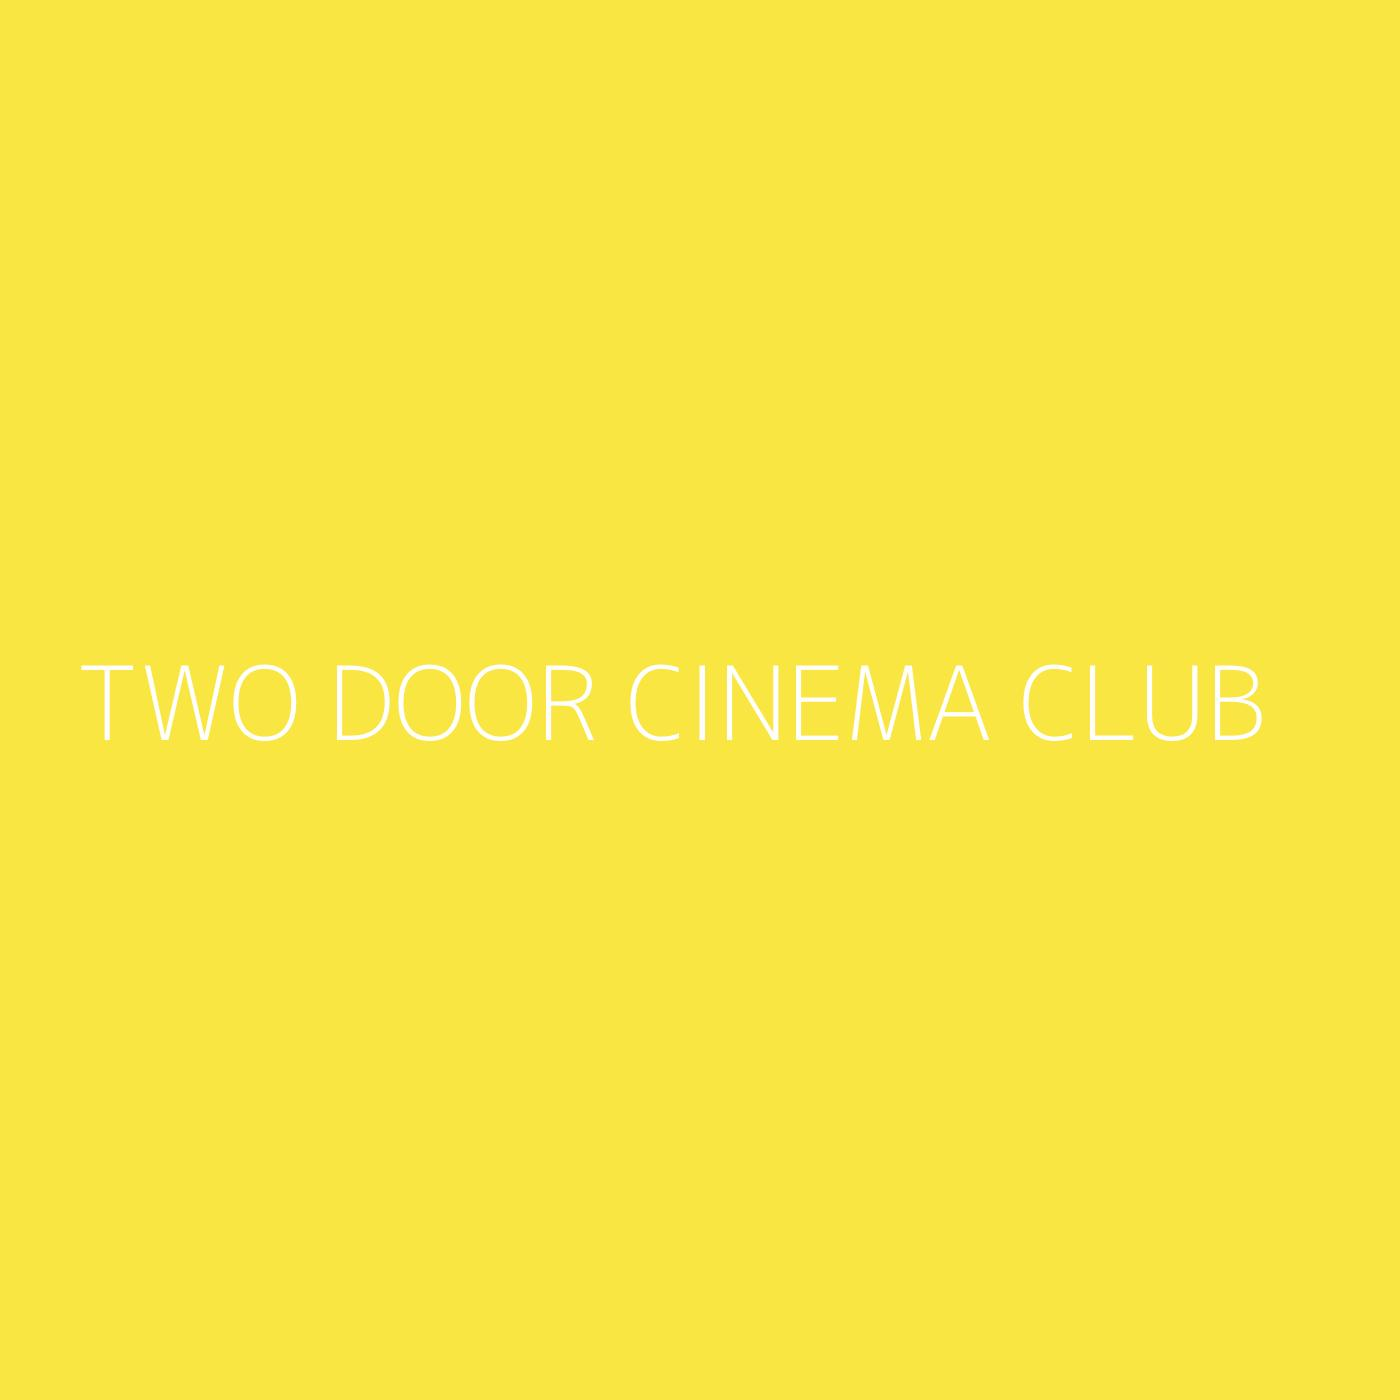 Two Door Cinema Club Playlist Artwork